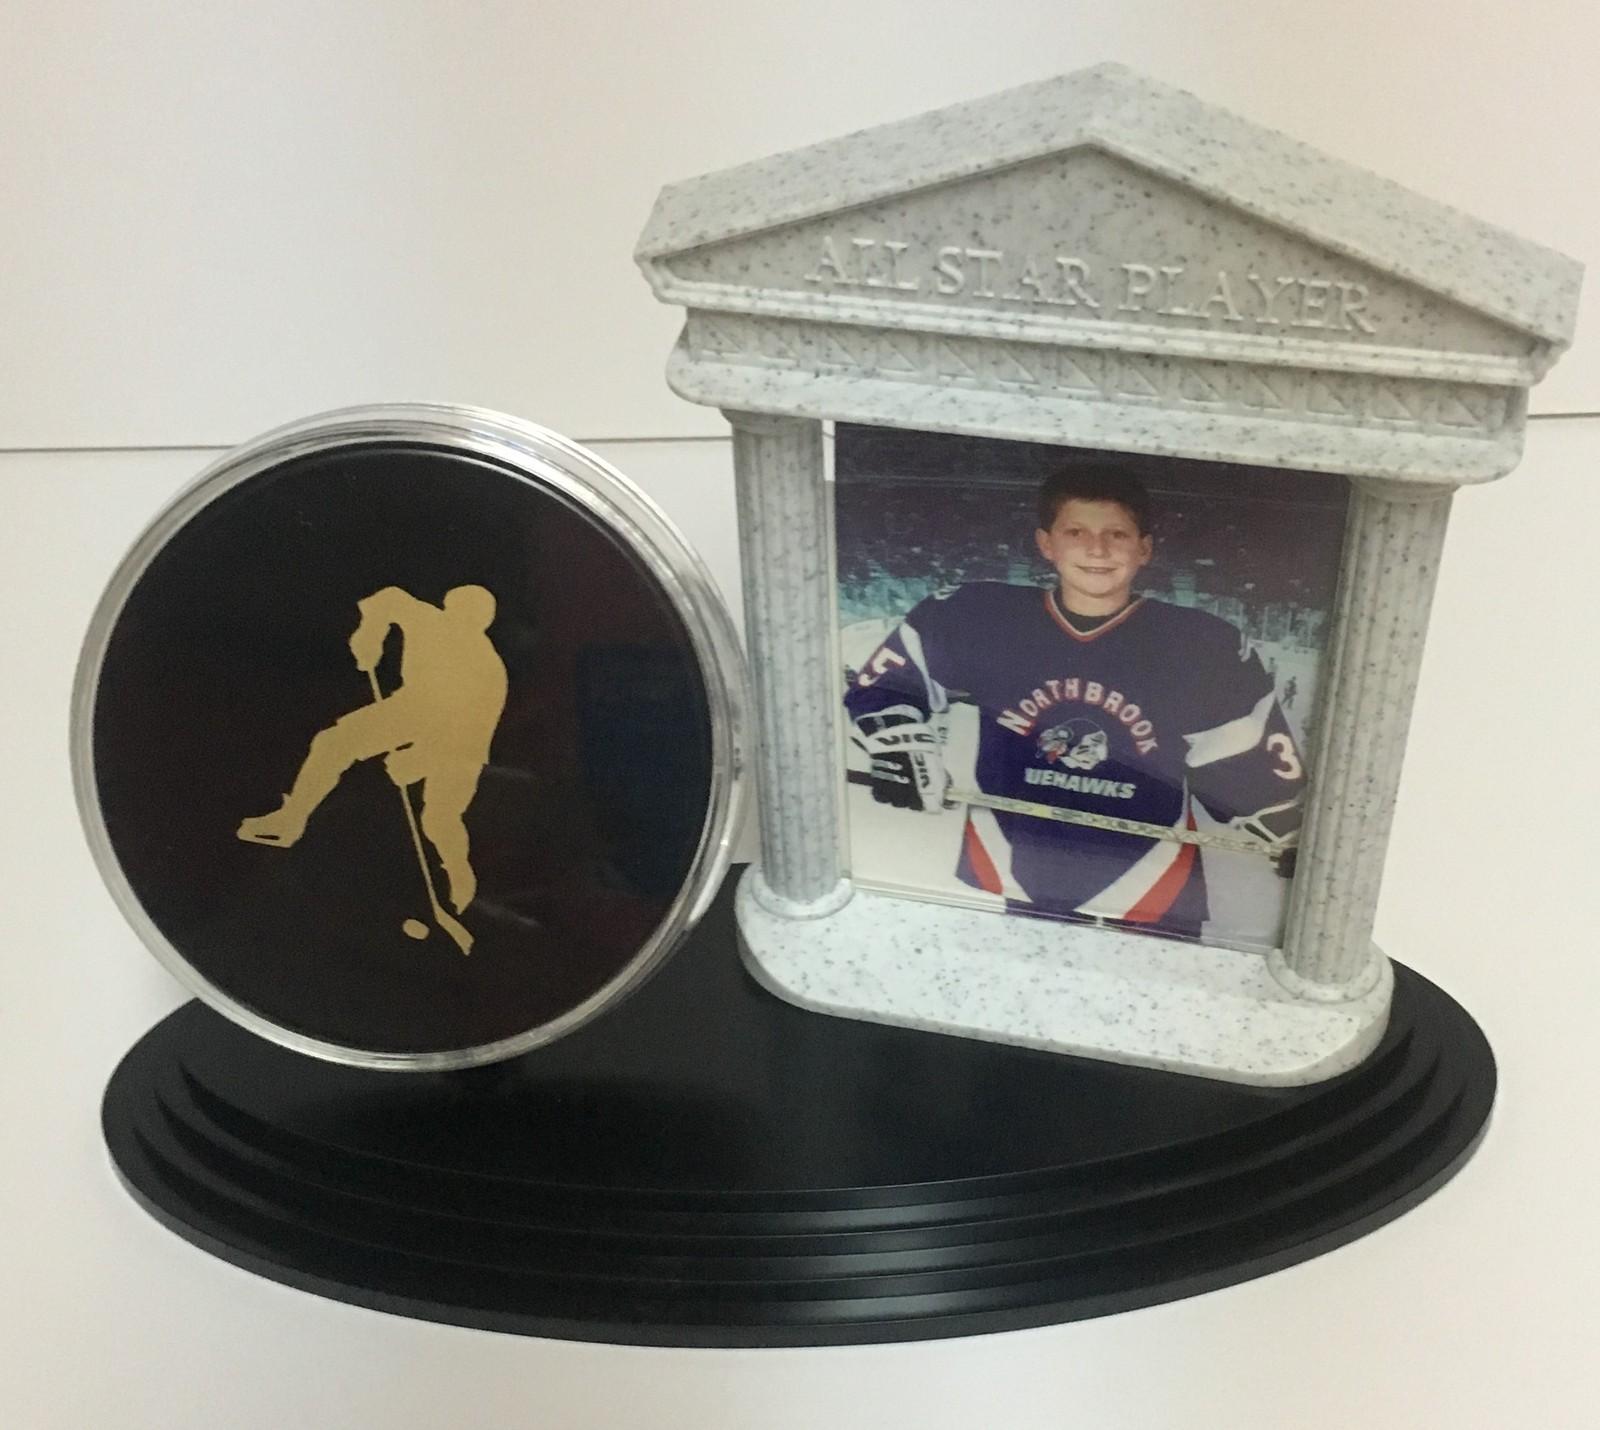 "Hockey All Star Player Photo Frame & Stand 3"" x 2.5"" Photo"